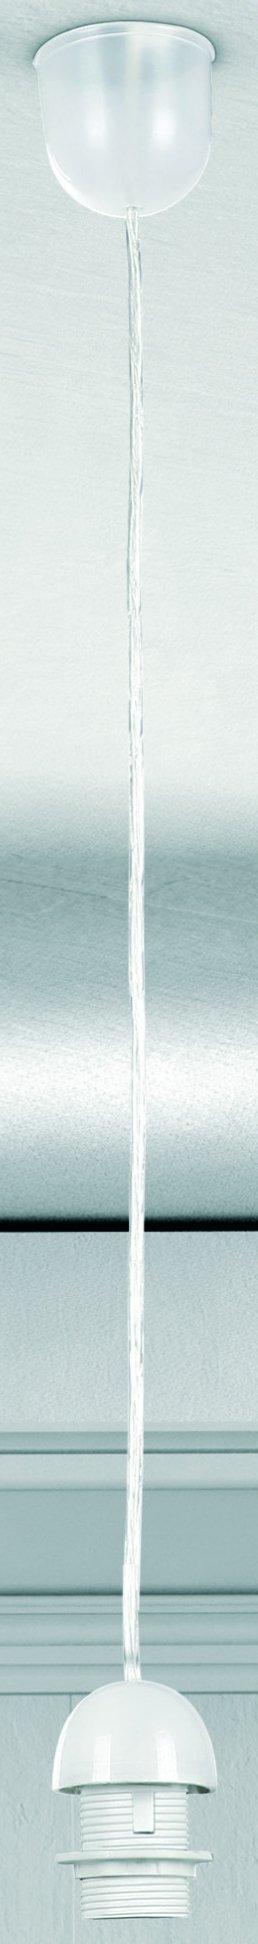 Светильник подвесной Globo A1Ожидается<br><br><br>Тип цоколя: E27<br>Диаметр, мм мм: 70<br>Высота, мм: 1000<br>Цвет арматуры: белый